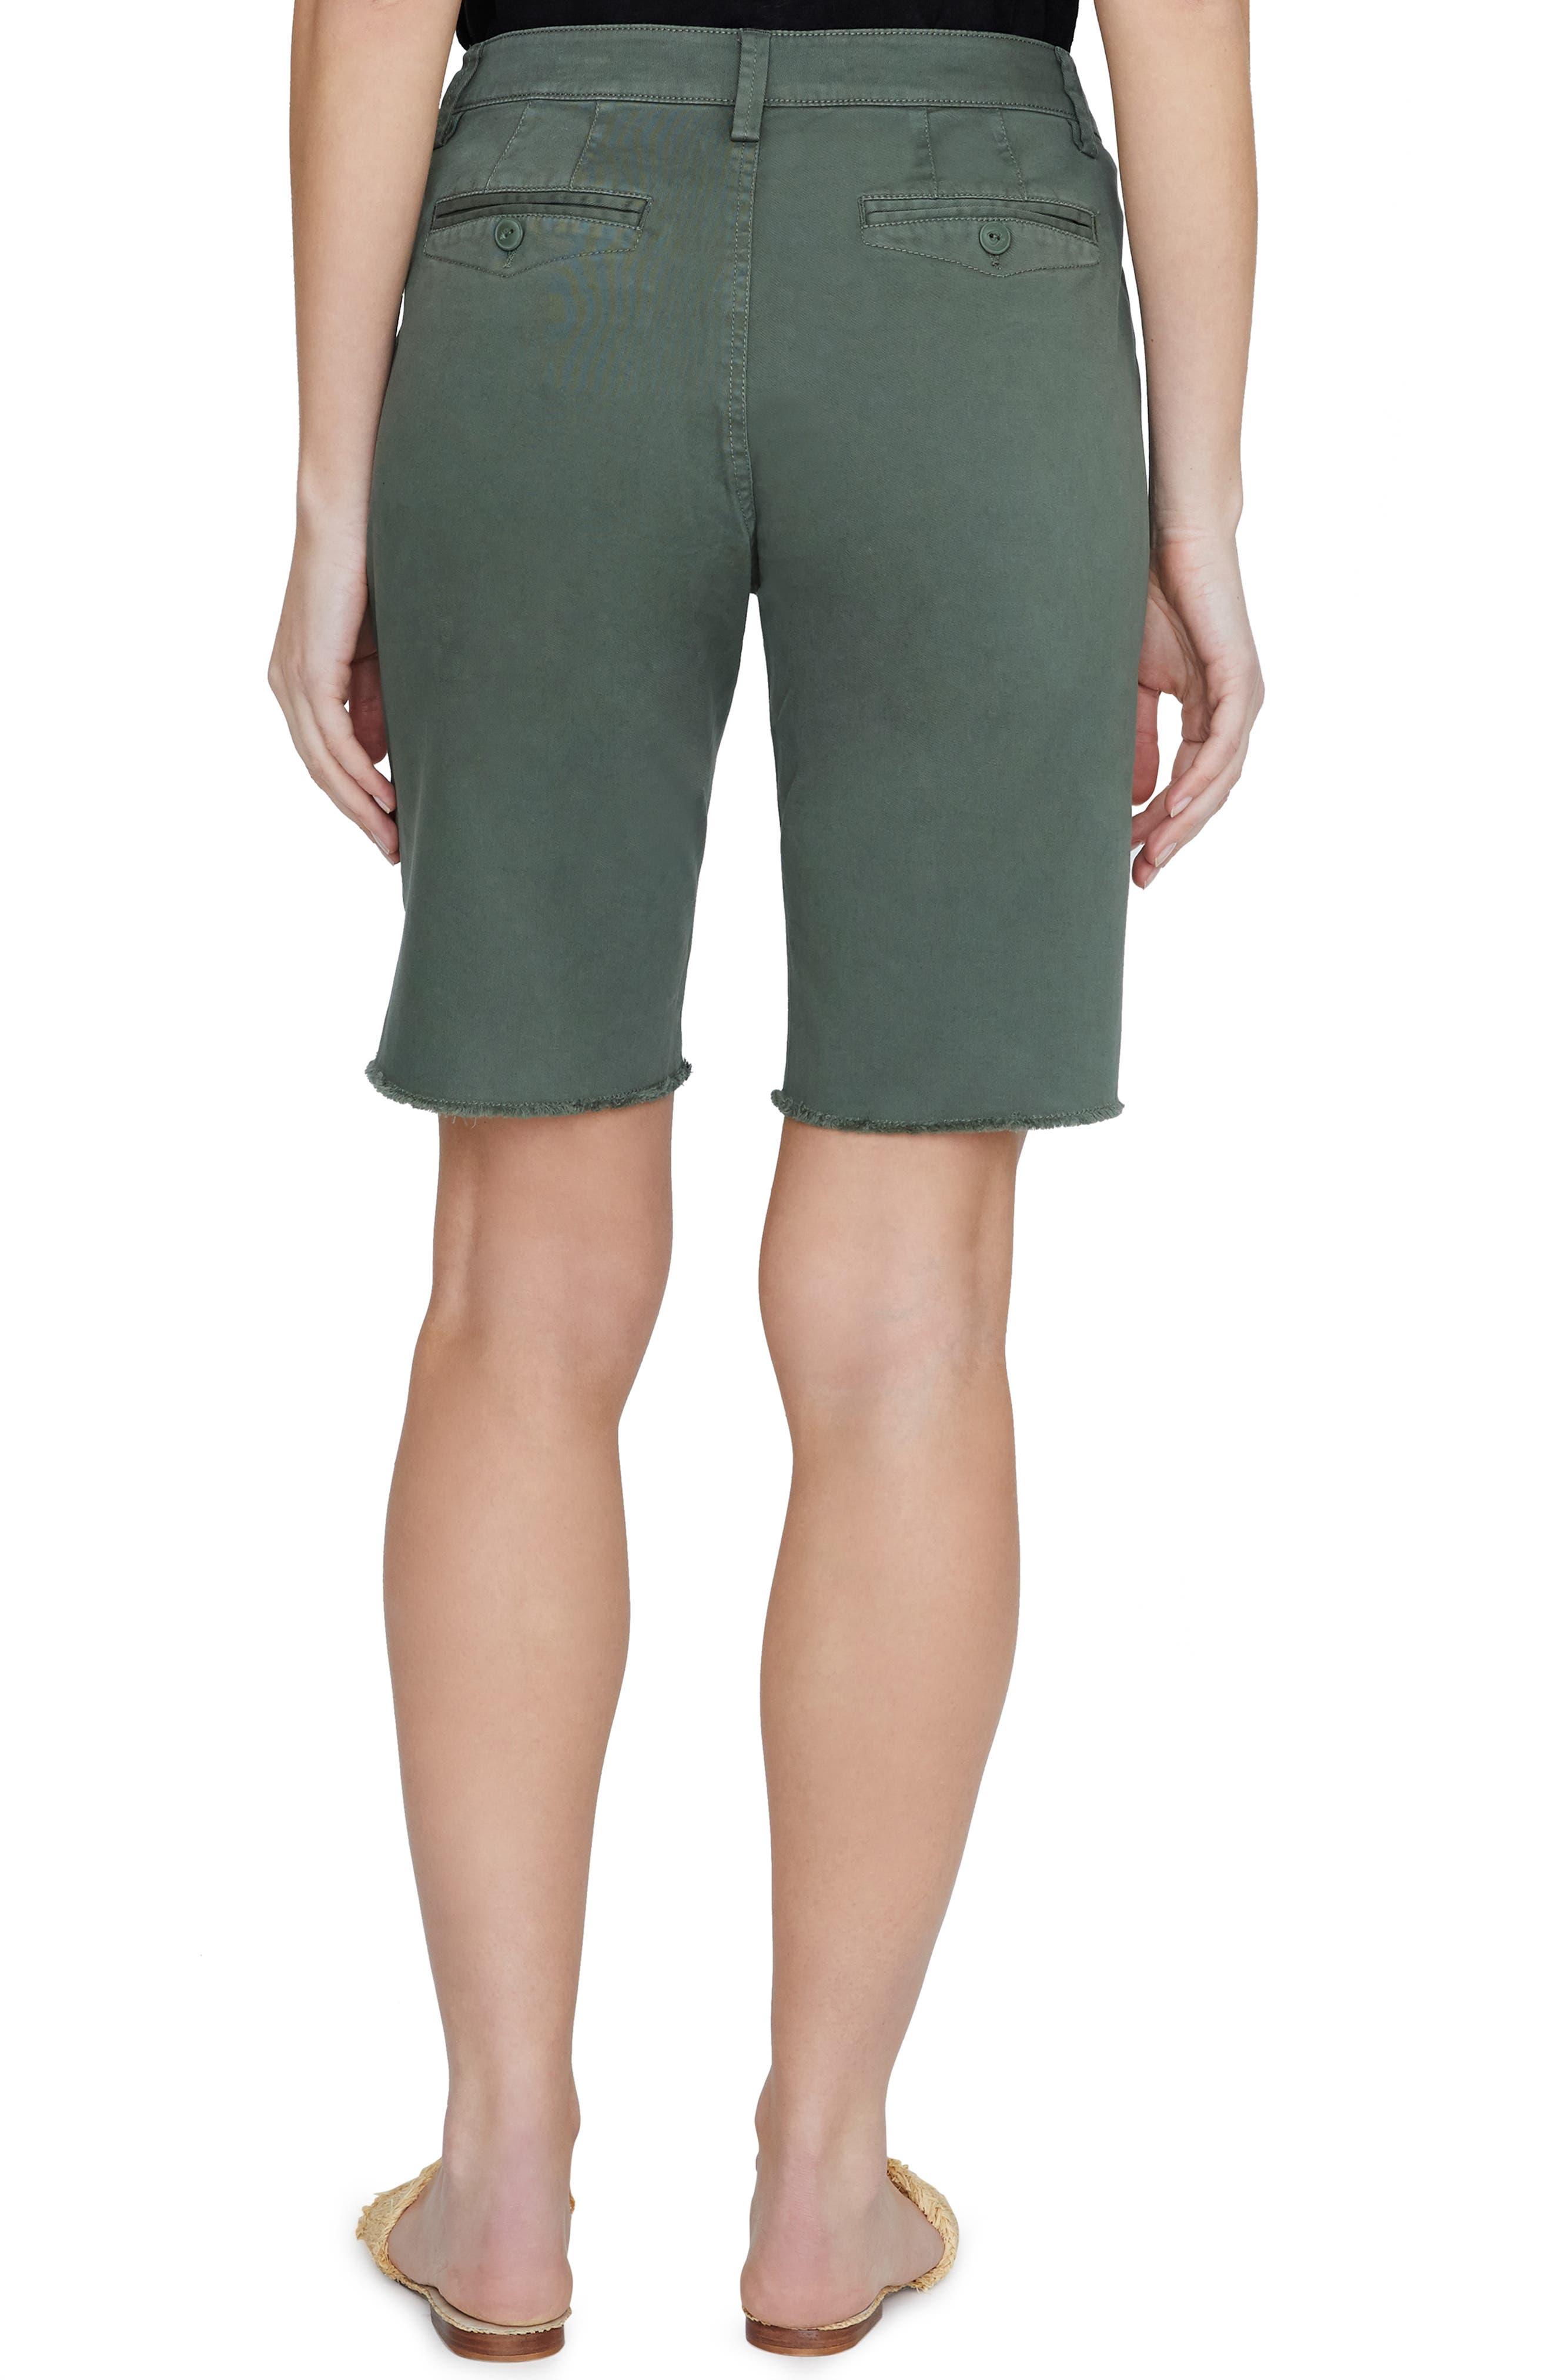 SANCTUARY, Boardwalk Bermuda Shorts, Alternate thumbnail 2, color, PEACE GREEN